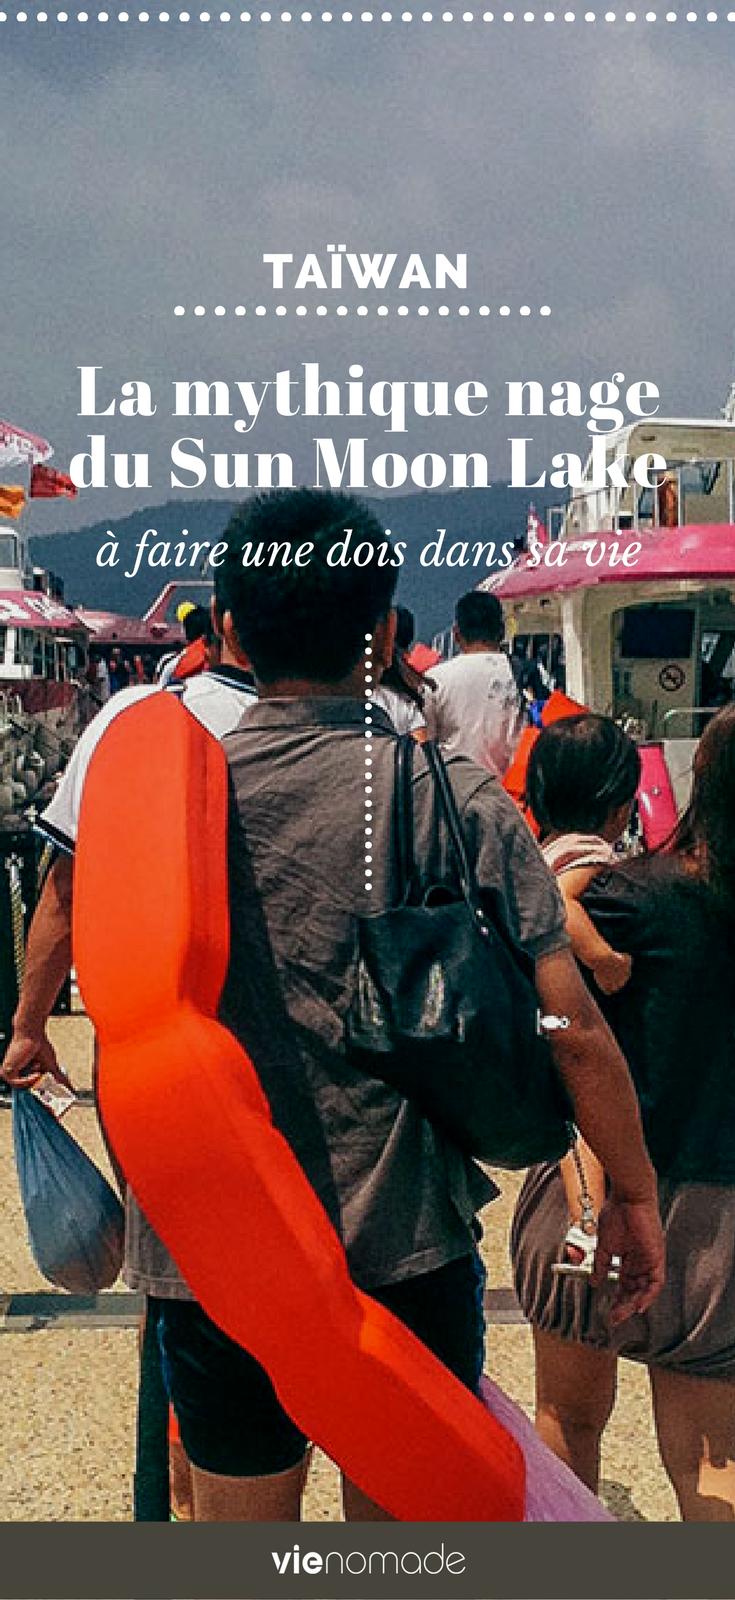 Nager au Sun Moon Lake à Taïwan